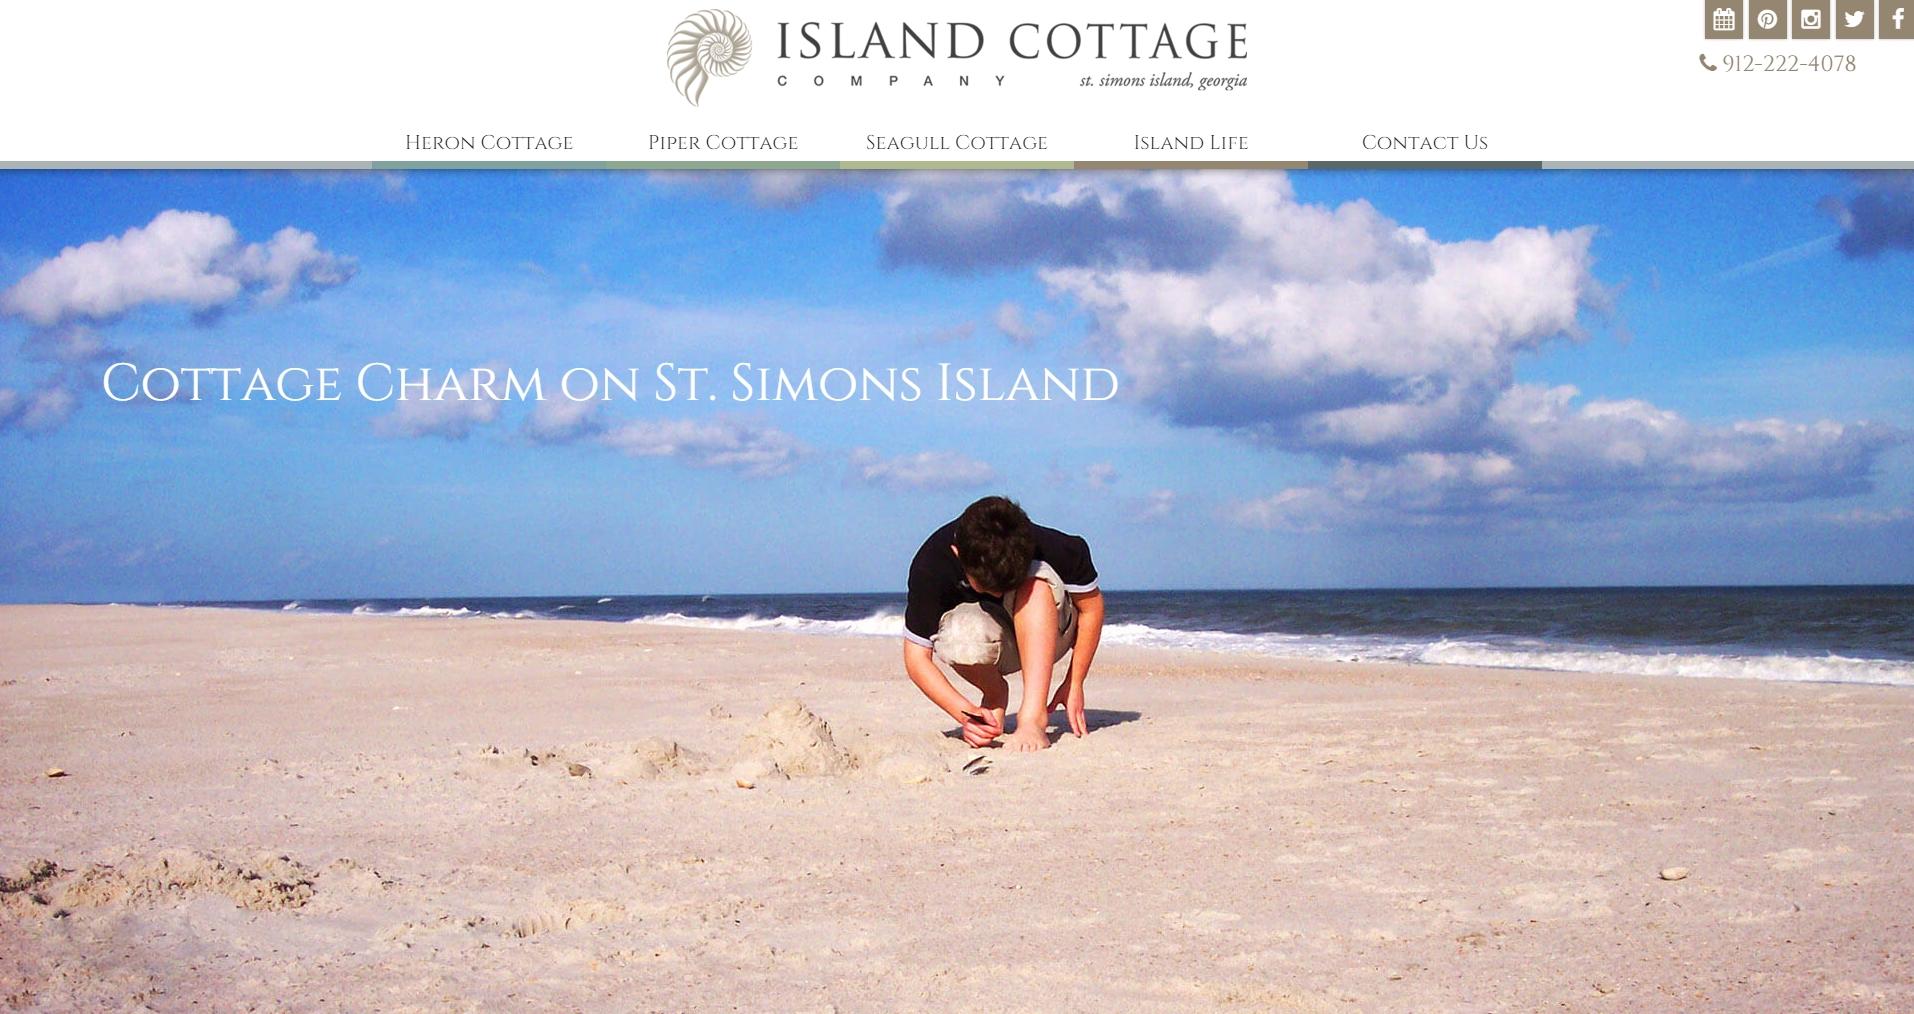 Island Cottage Company